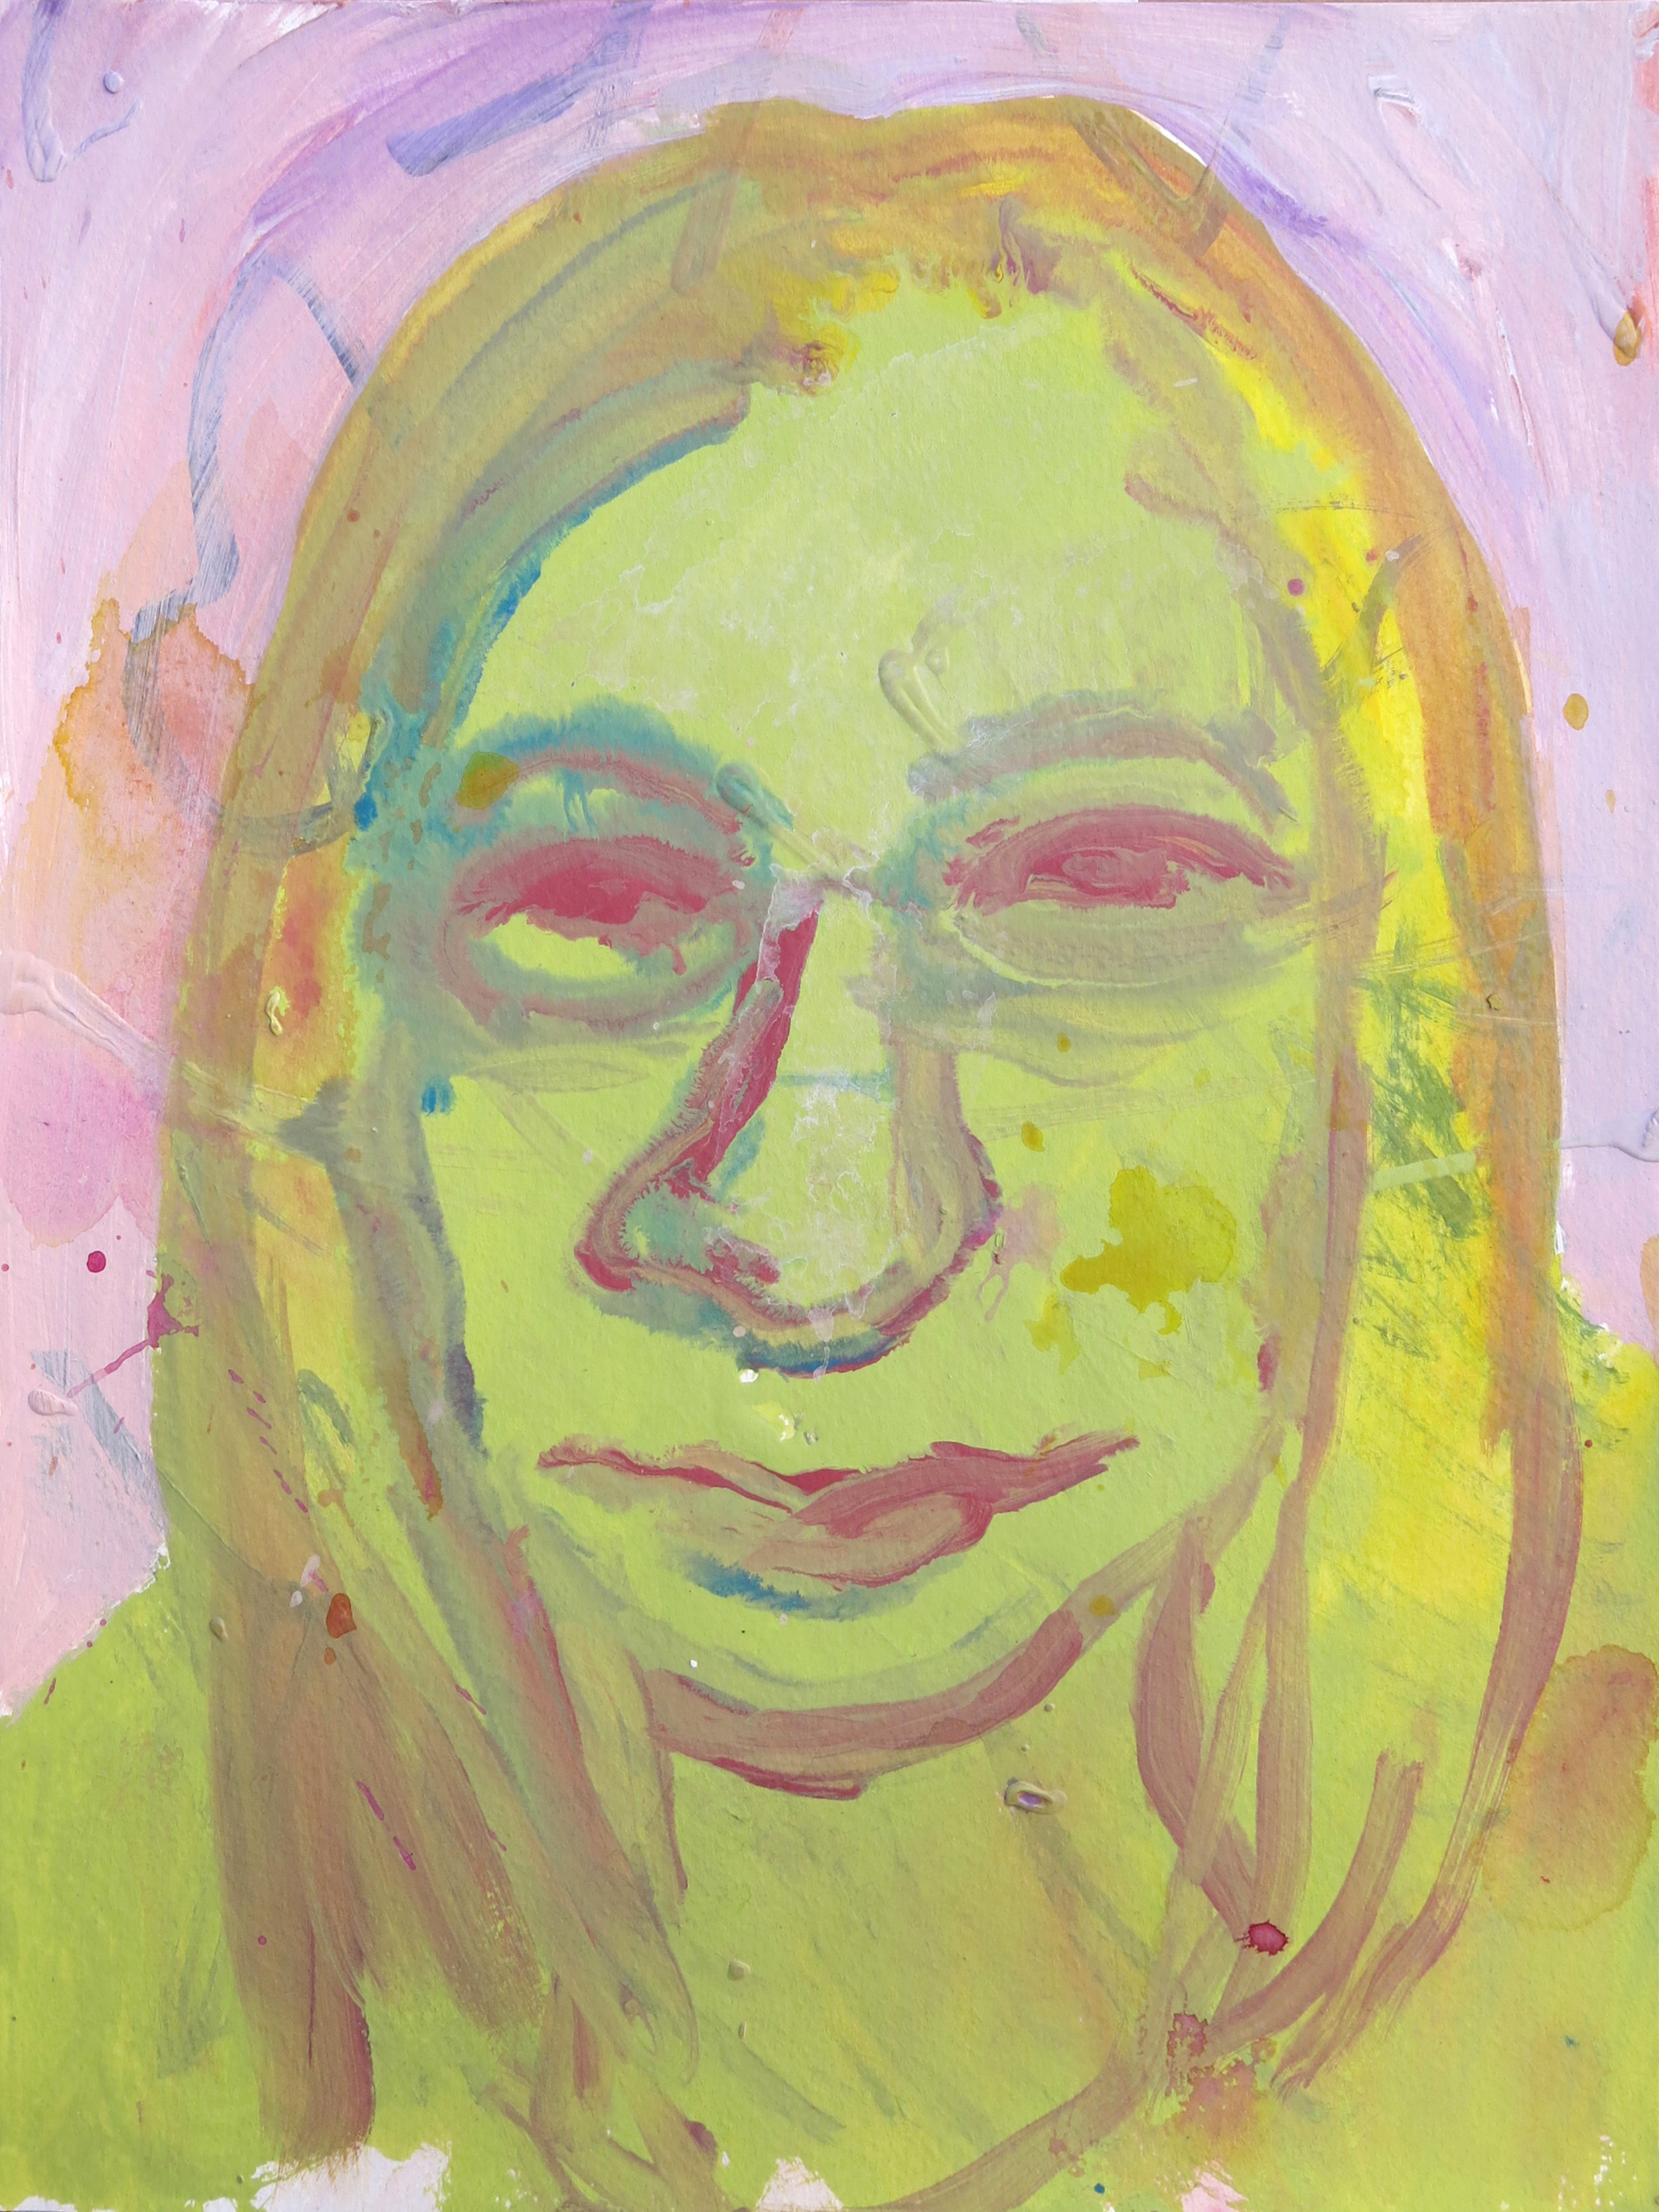 Barbra Streisand Portrait #111